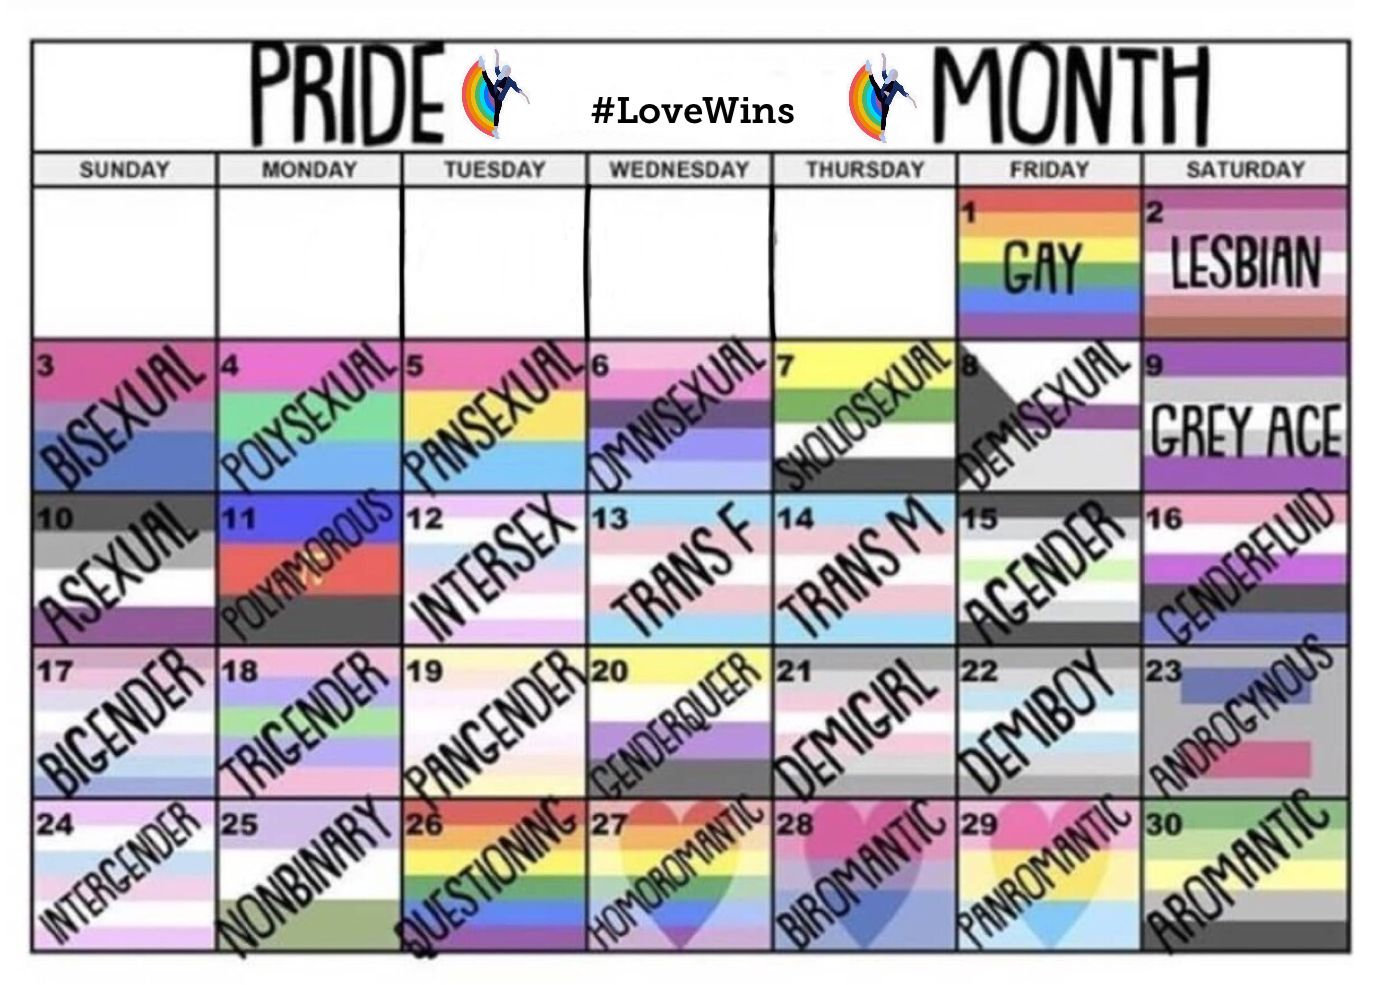 Pride Month Calendar.